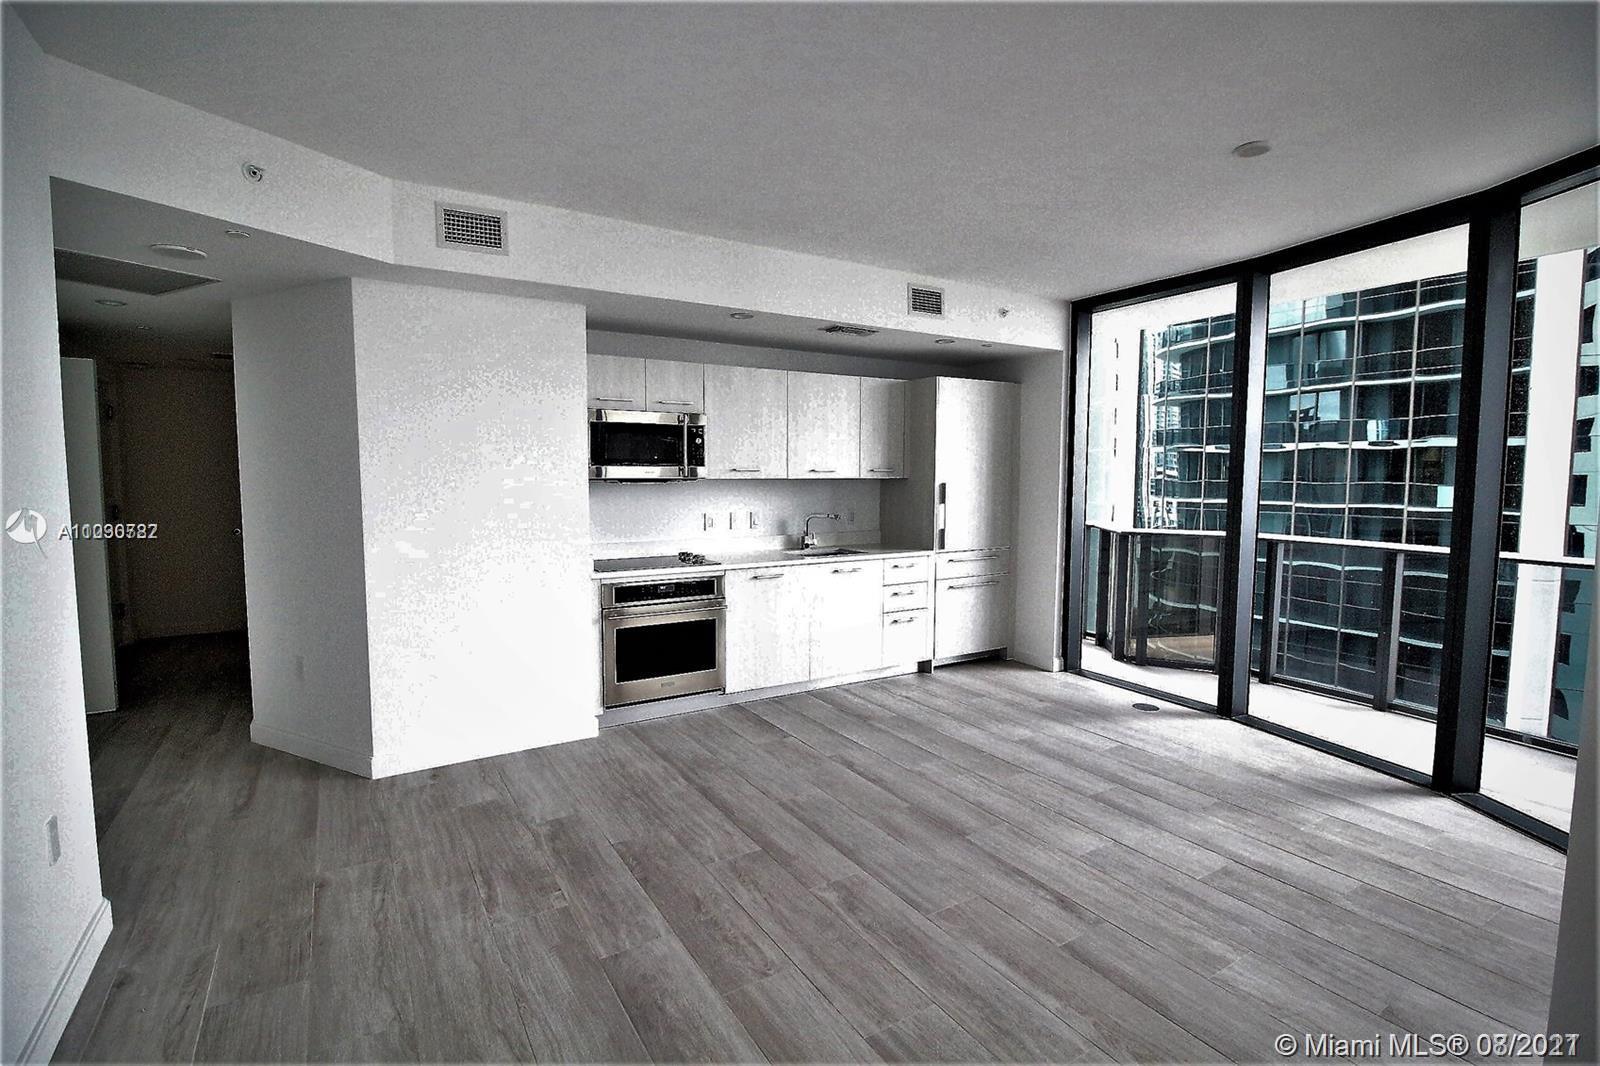 Апартамент с двумя спальнями в Brickell Heights, Майами